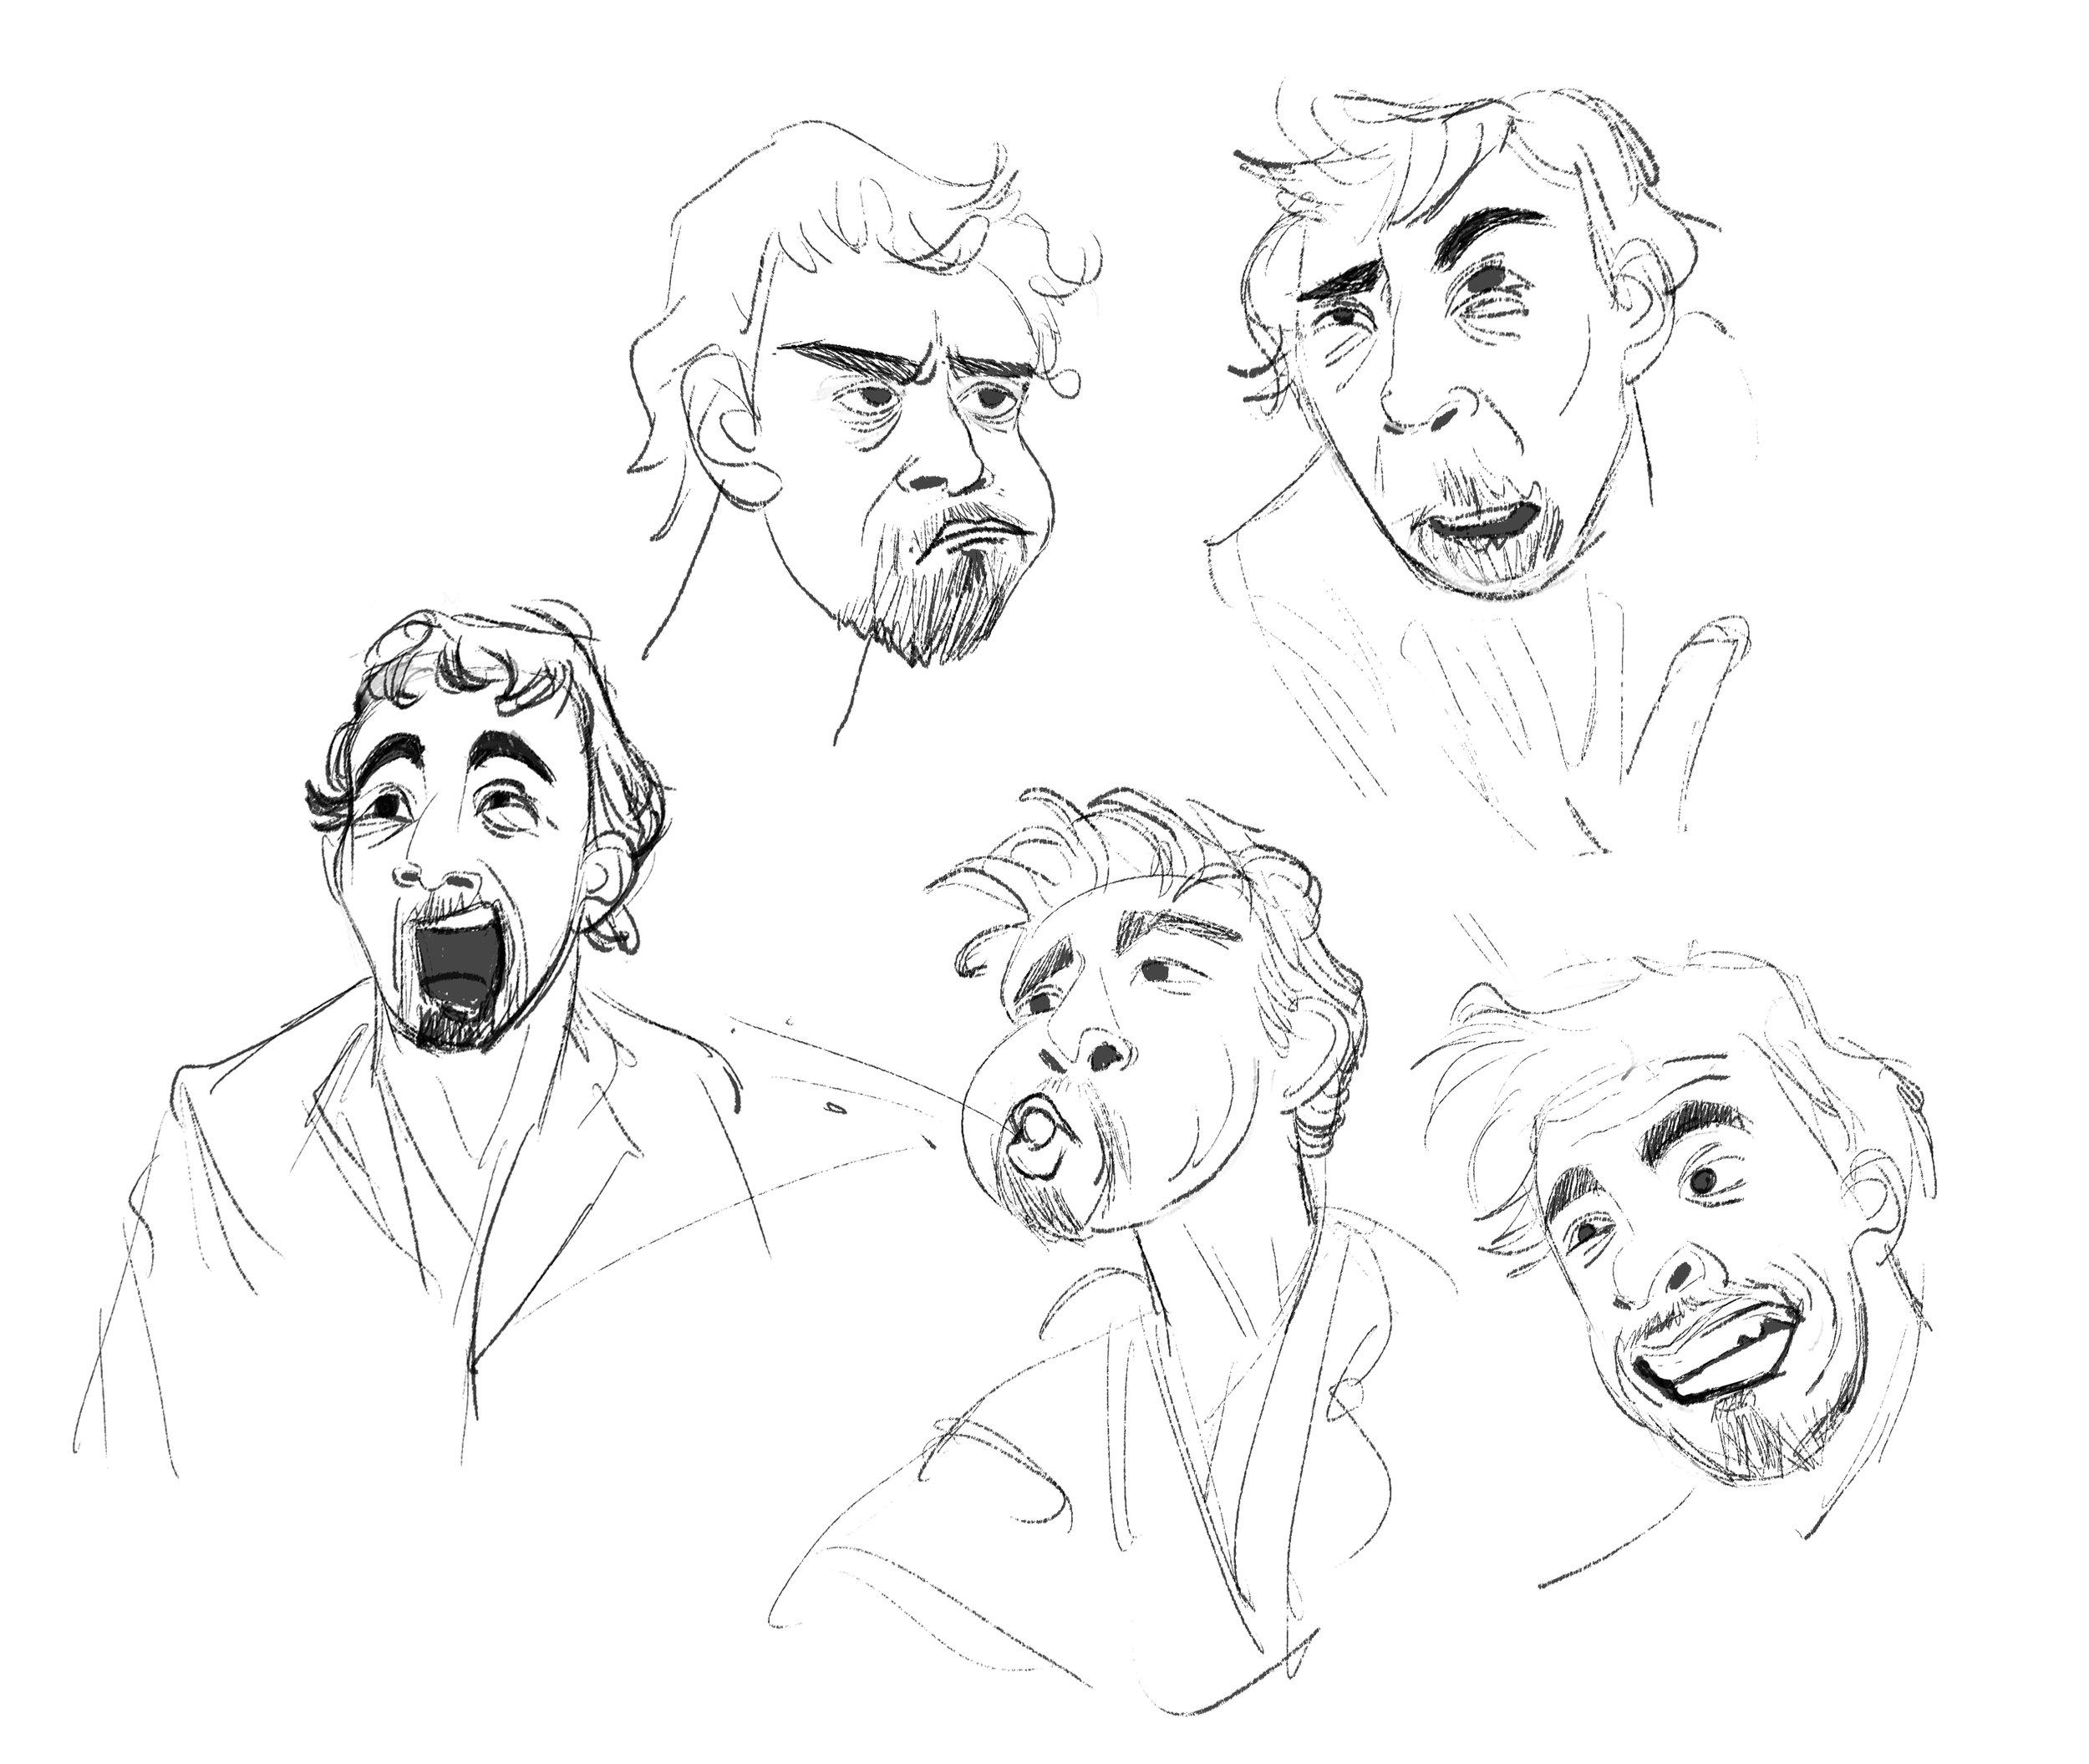 Caricature studies from Umbrella Academy